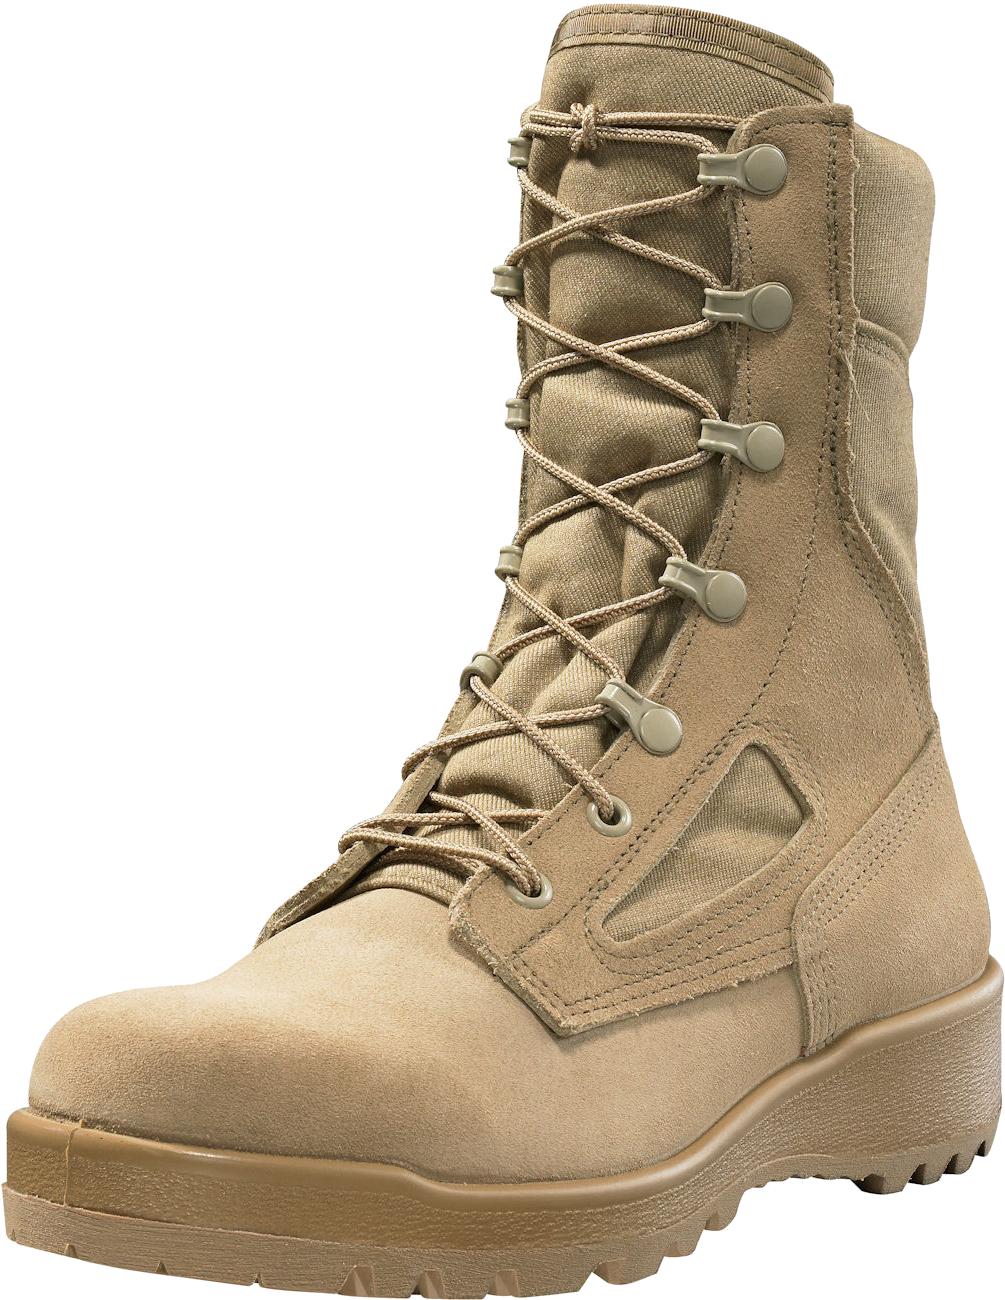 Desert tan combat boots. Hike clipart brown boot